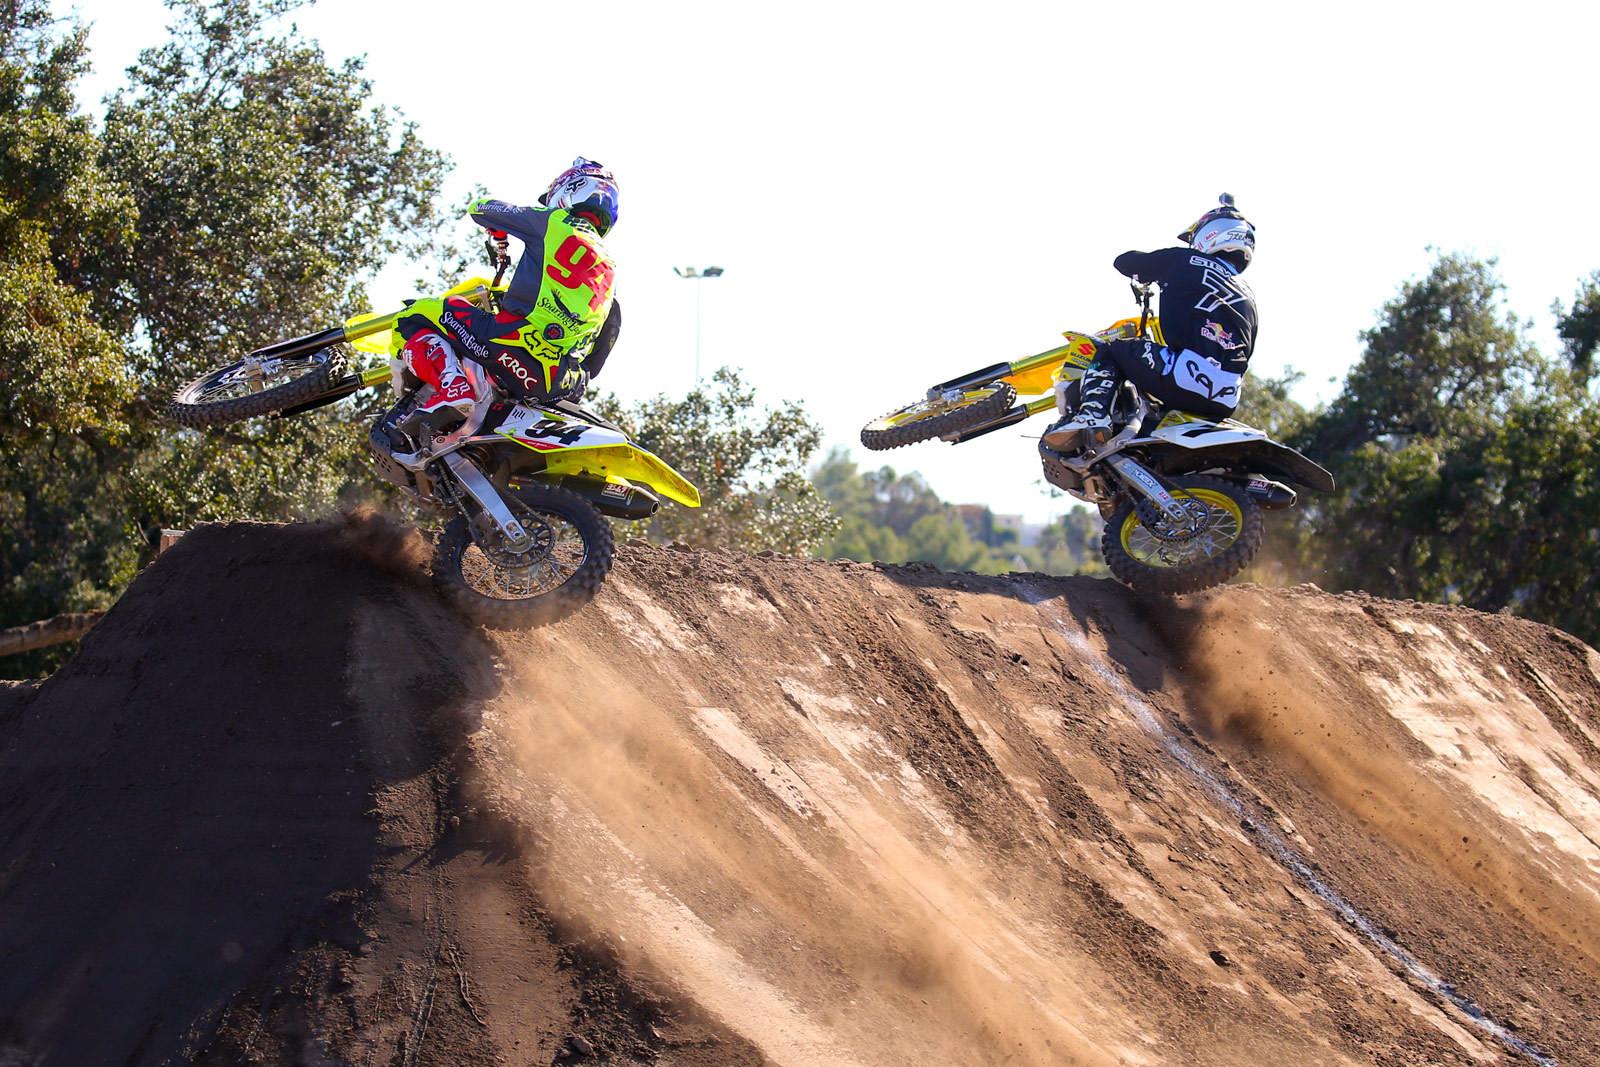 Ken Roczen and James Stewart - Photo Blast: Red Bull Straight Rhythm - Motocross Pictures - Vital MX